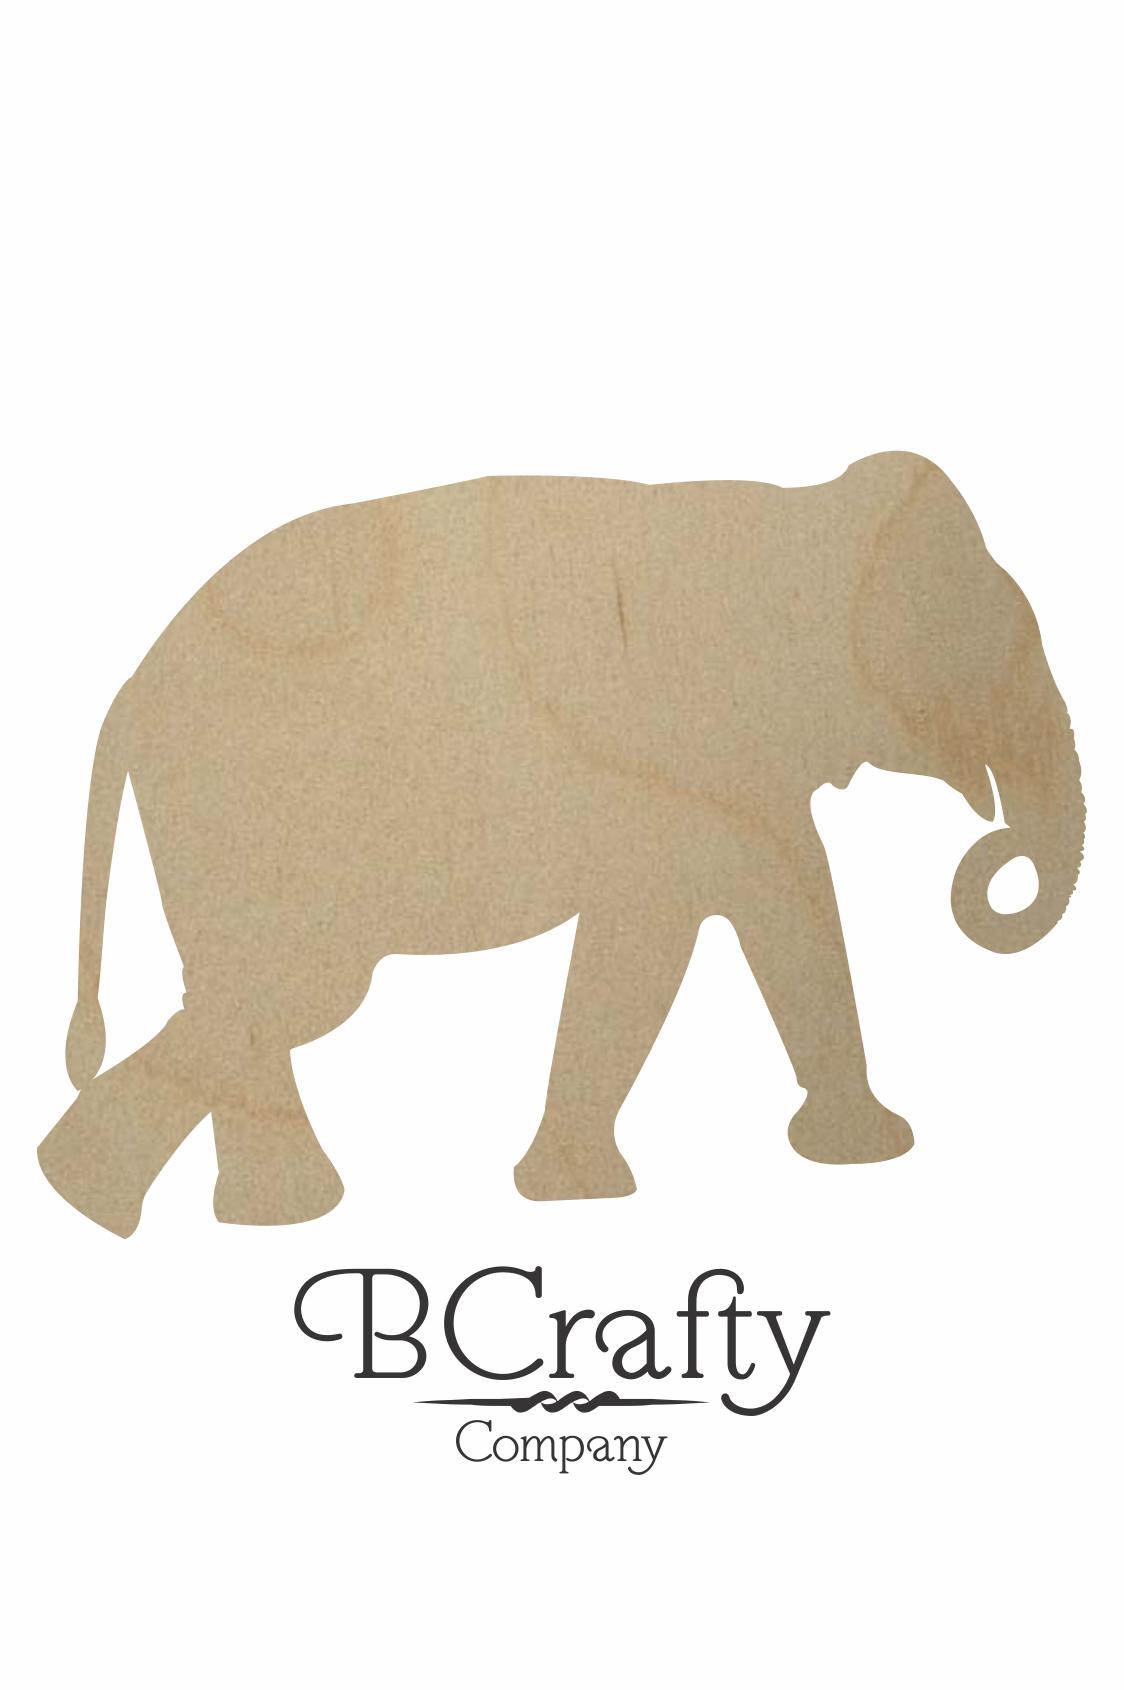 Wooden Elephant Shape By Bcrafty Company